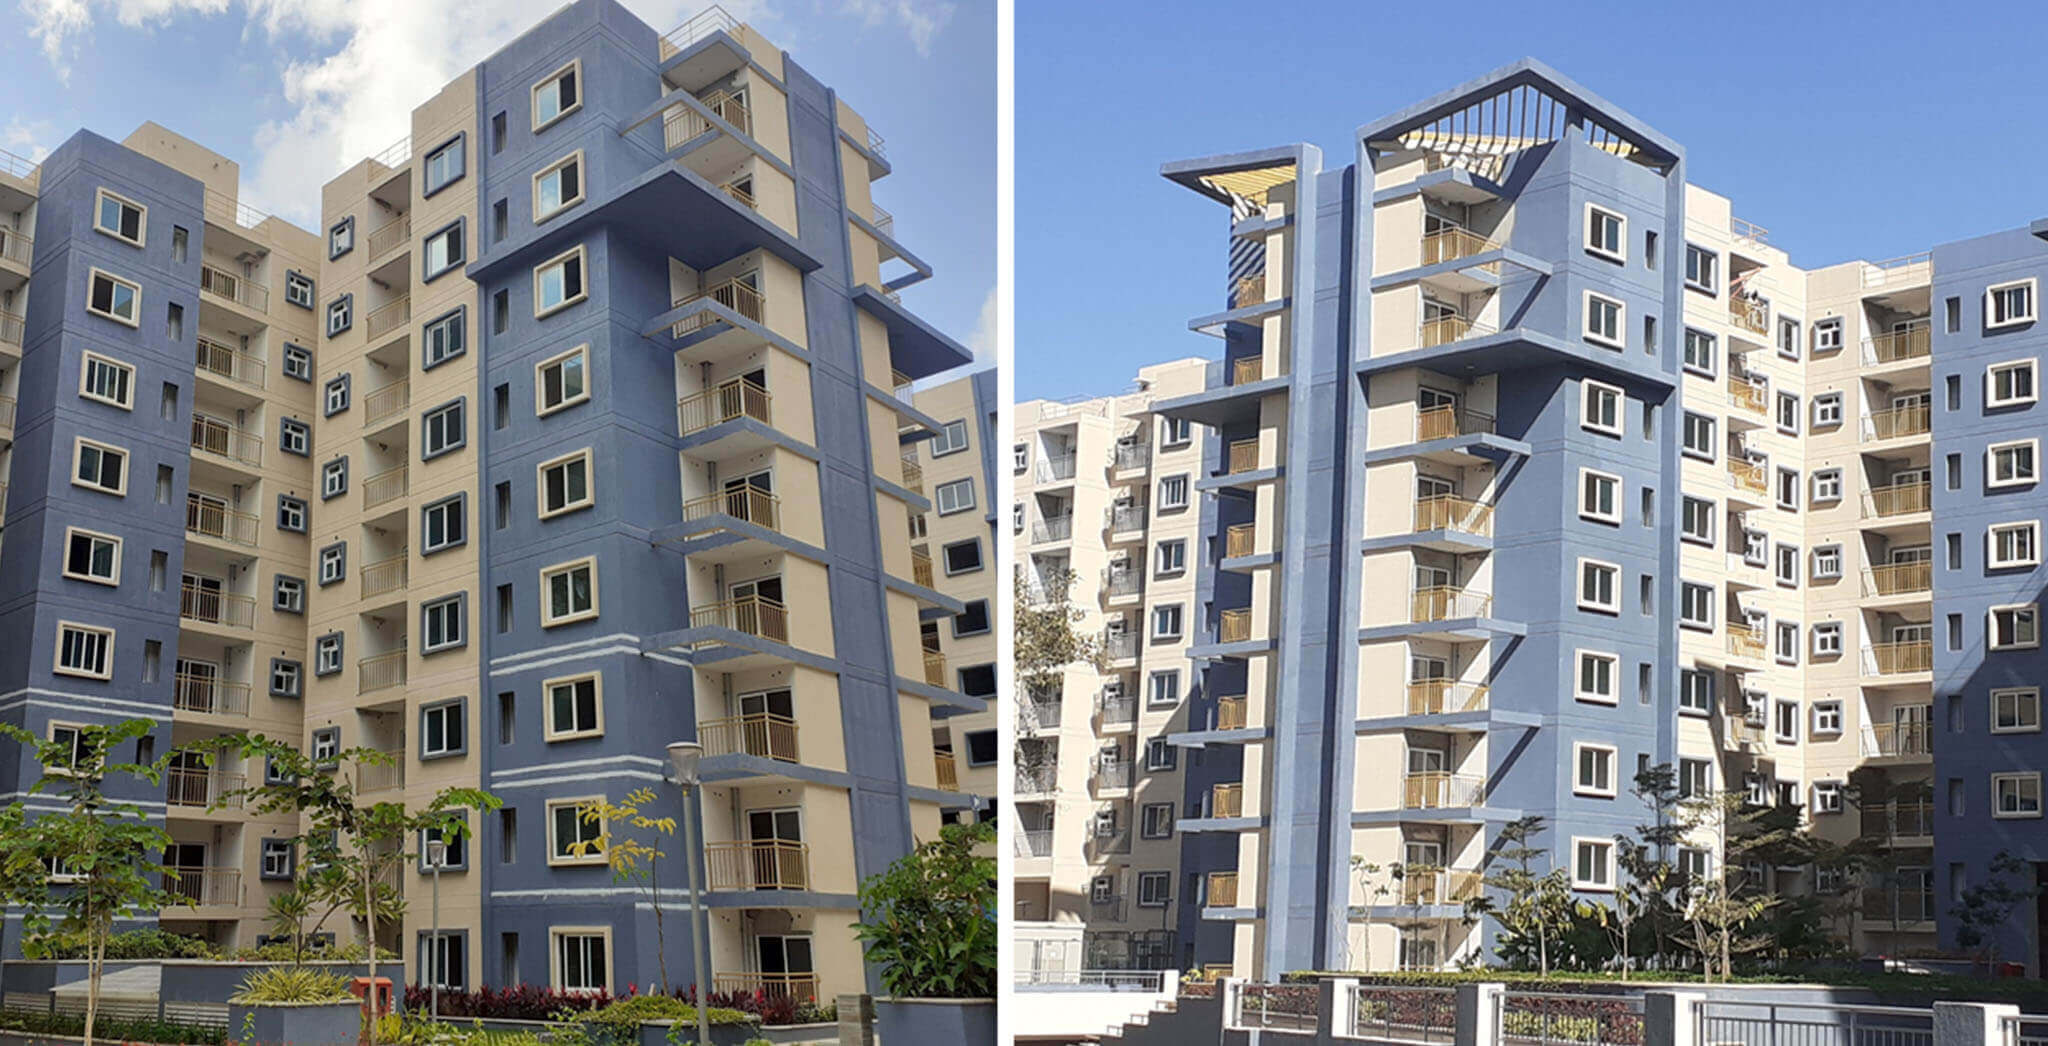 Sep 2020 - Towers C & D: Internal finishing work-in-progress